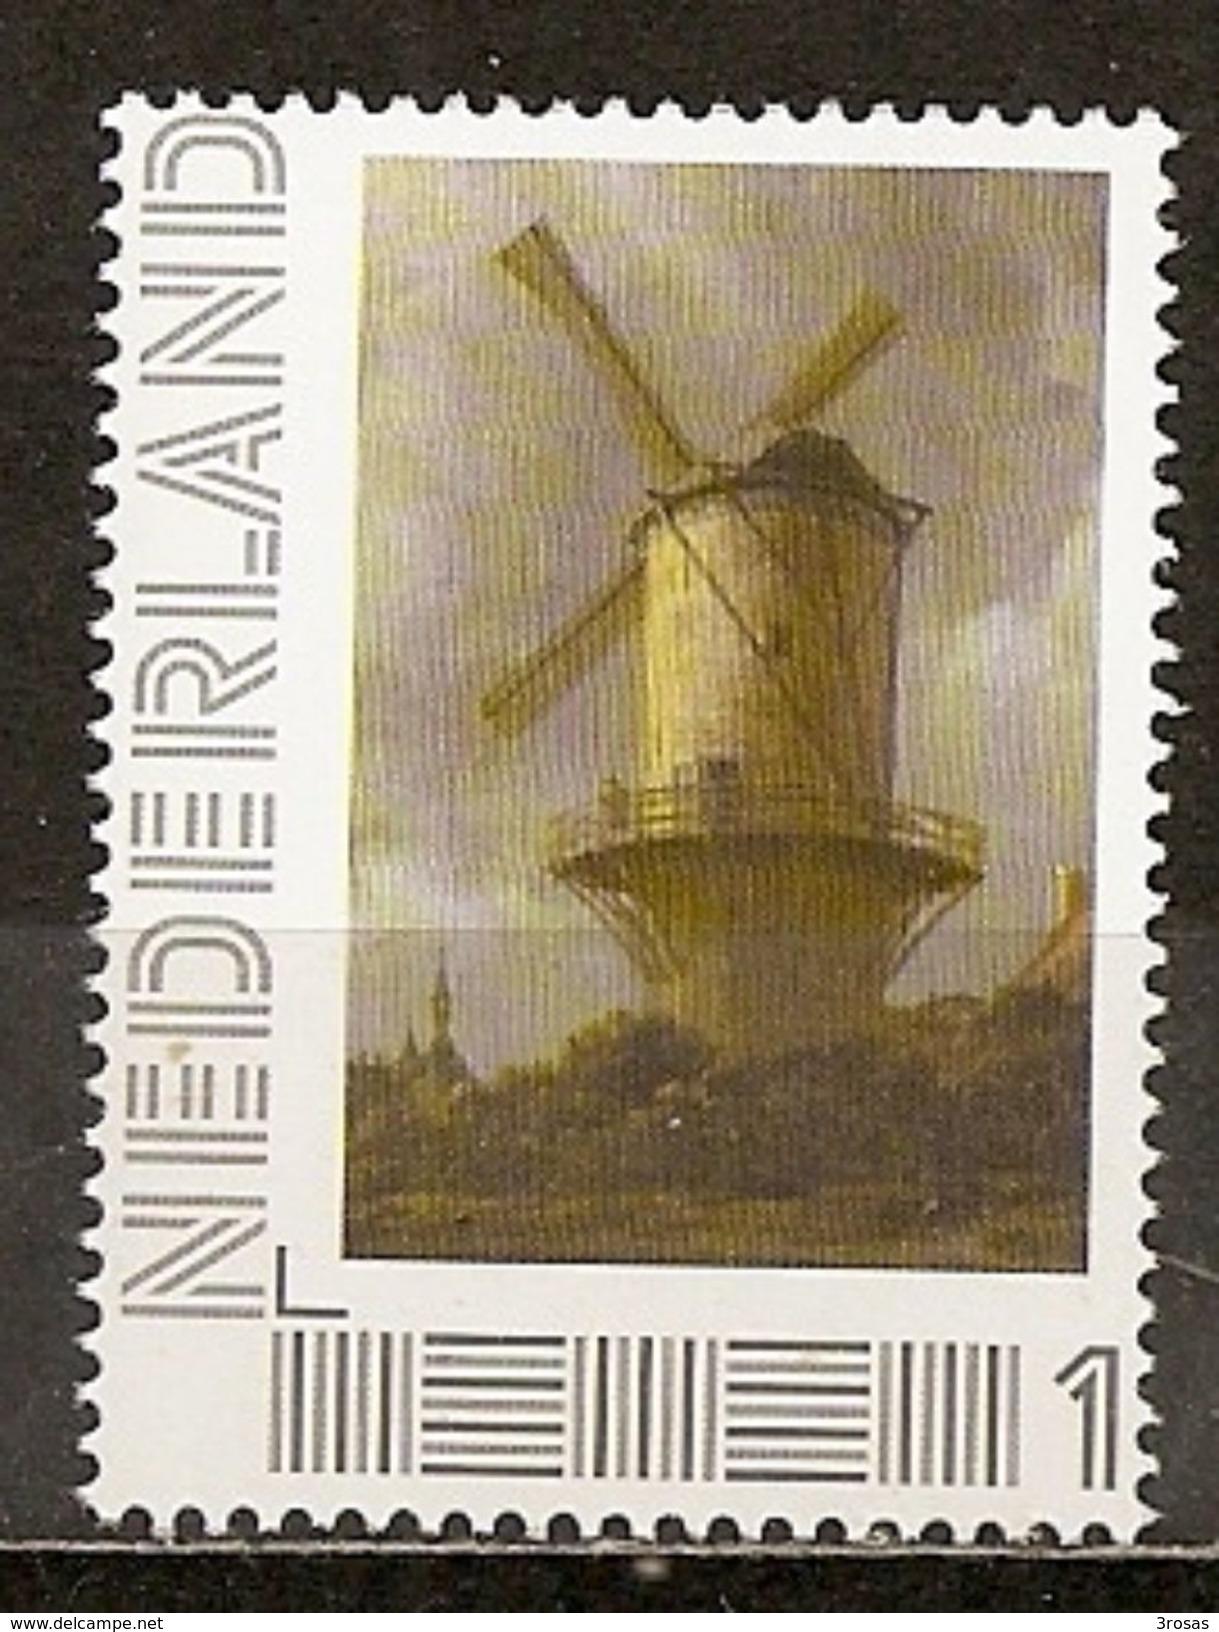 Pays-Bas Netherlands 201- Moulin Peinture Van Ruysdael Painting Windmill MNH ** - Period 2013-... (Willem-Alexander)